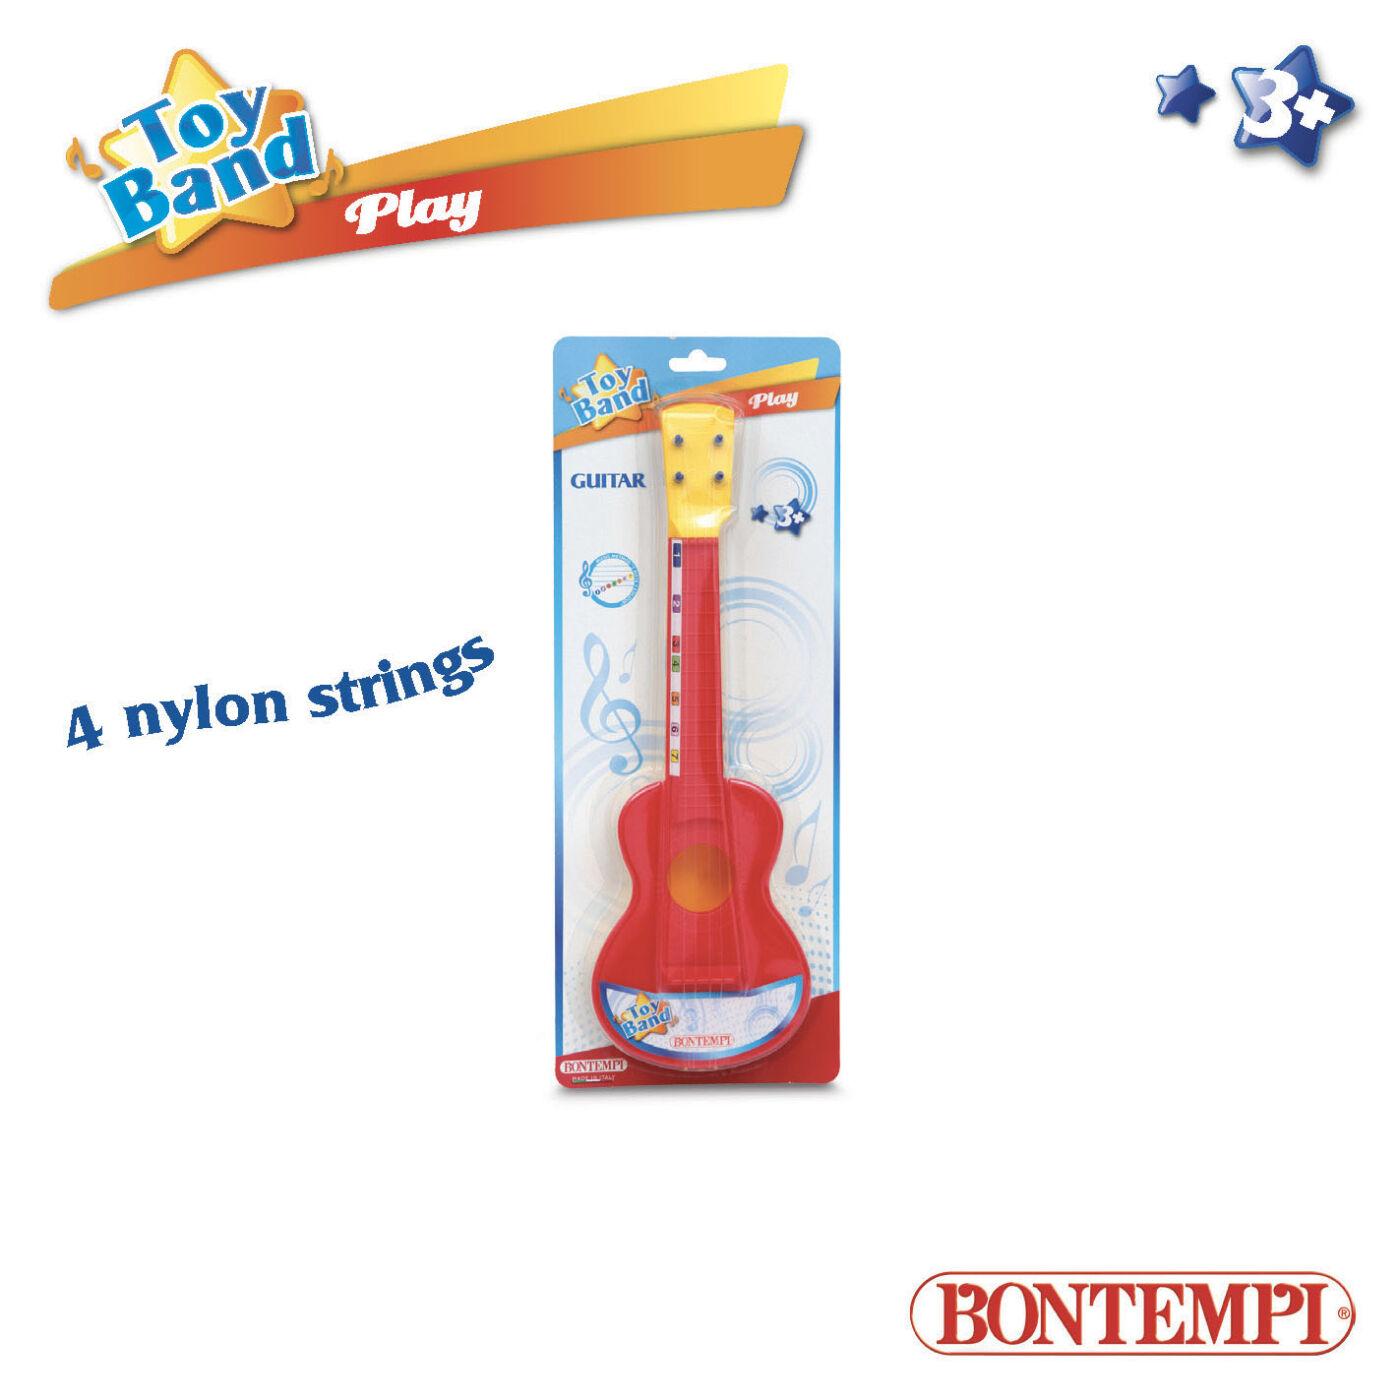 Bontempi Spanyol gitár